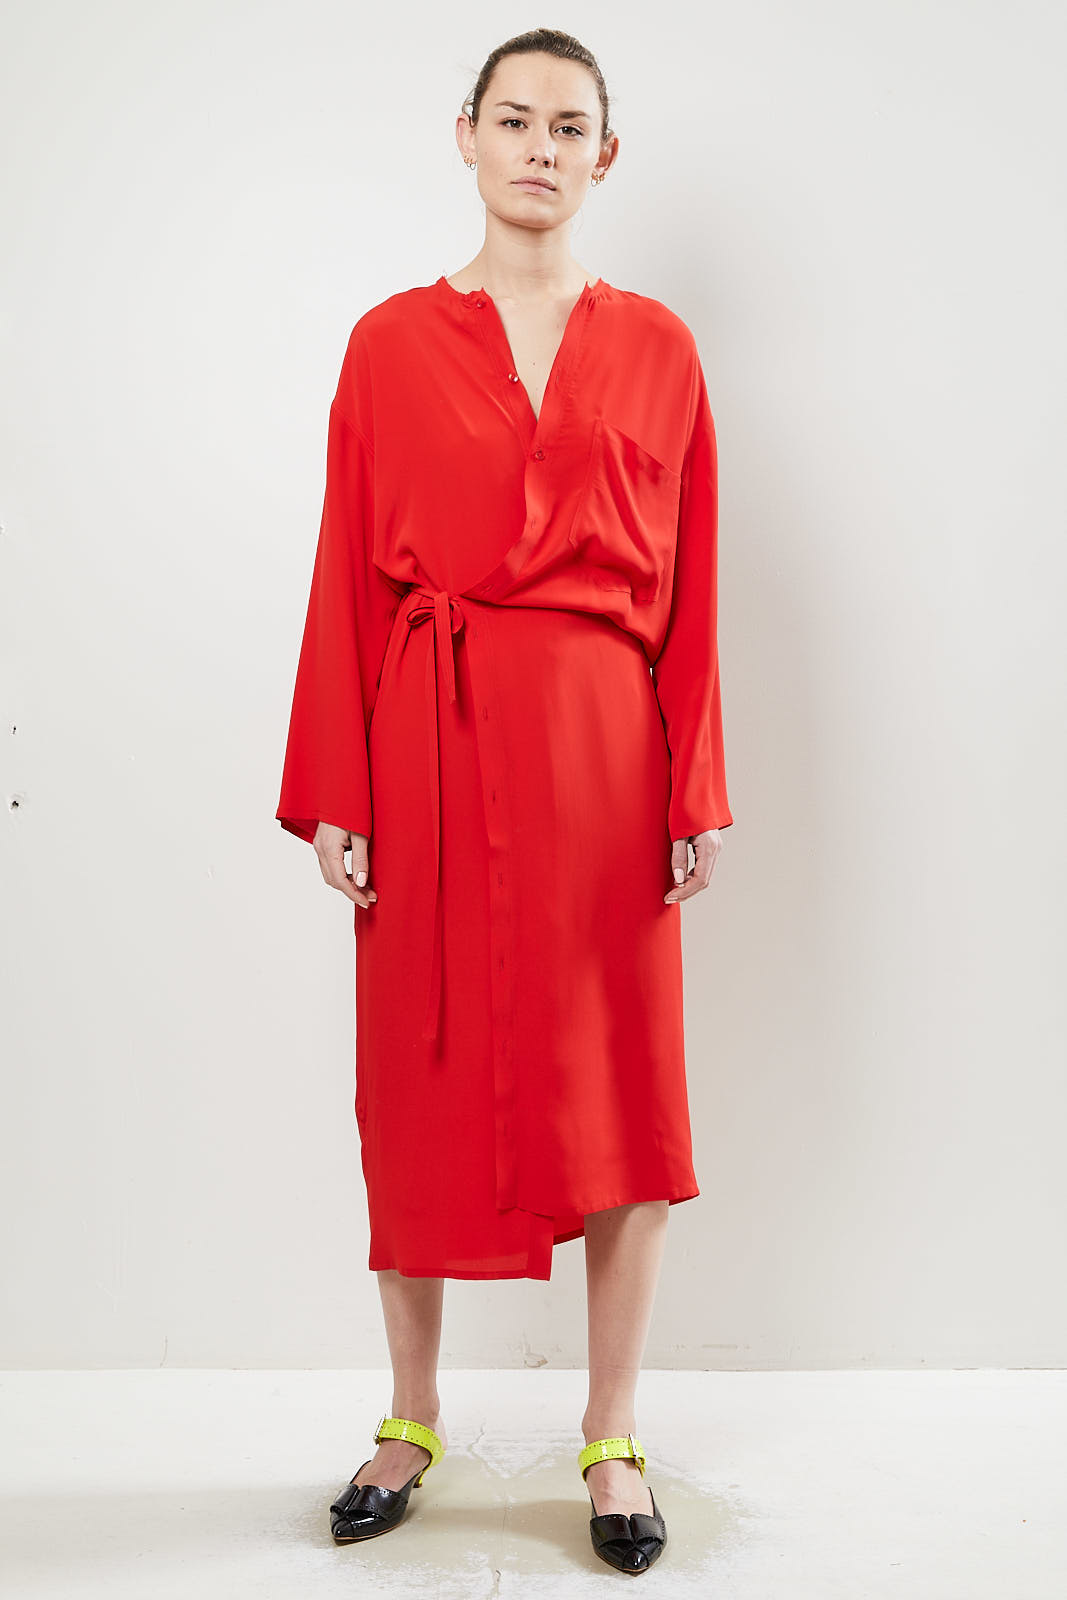 Monique van Heist wrapper dress red silky